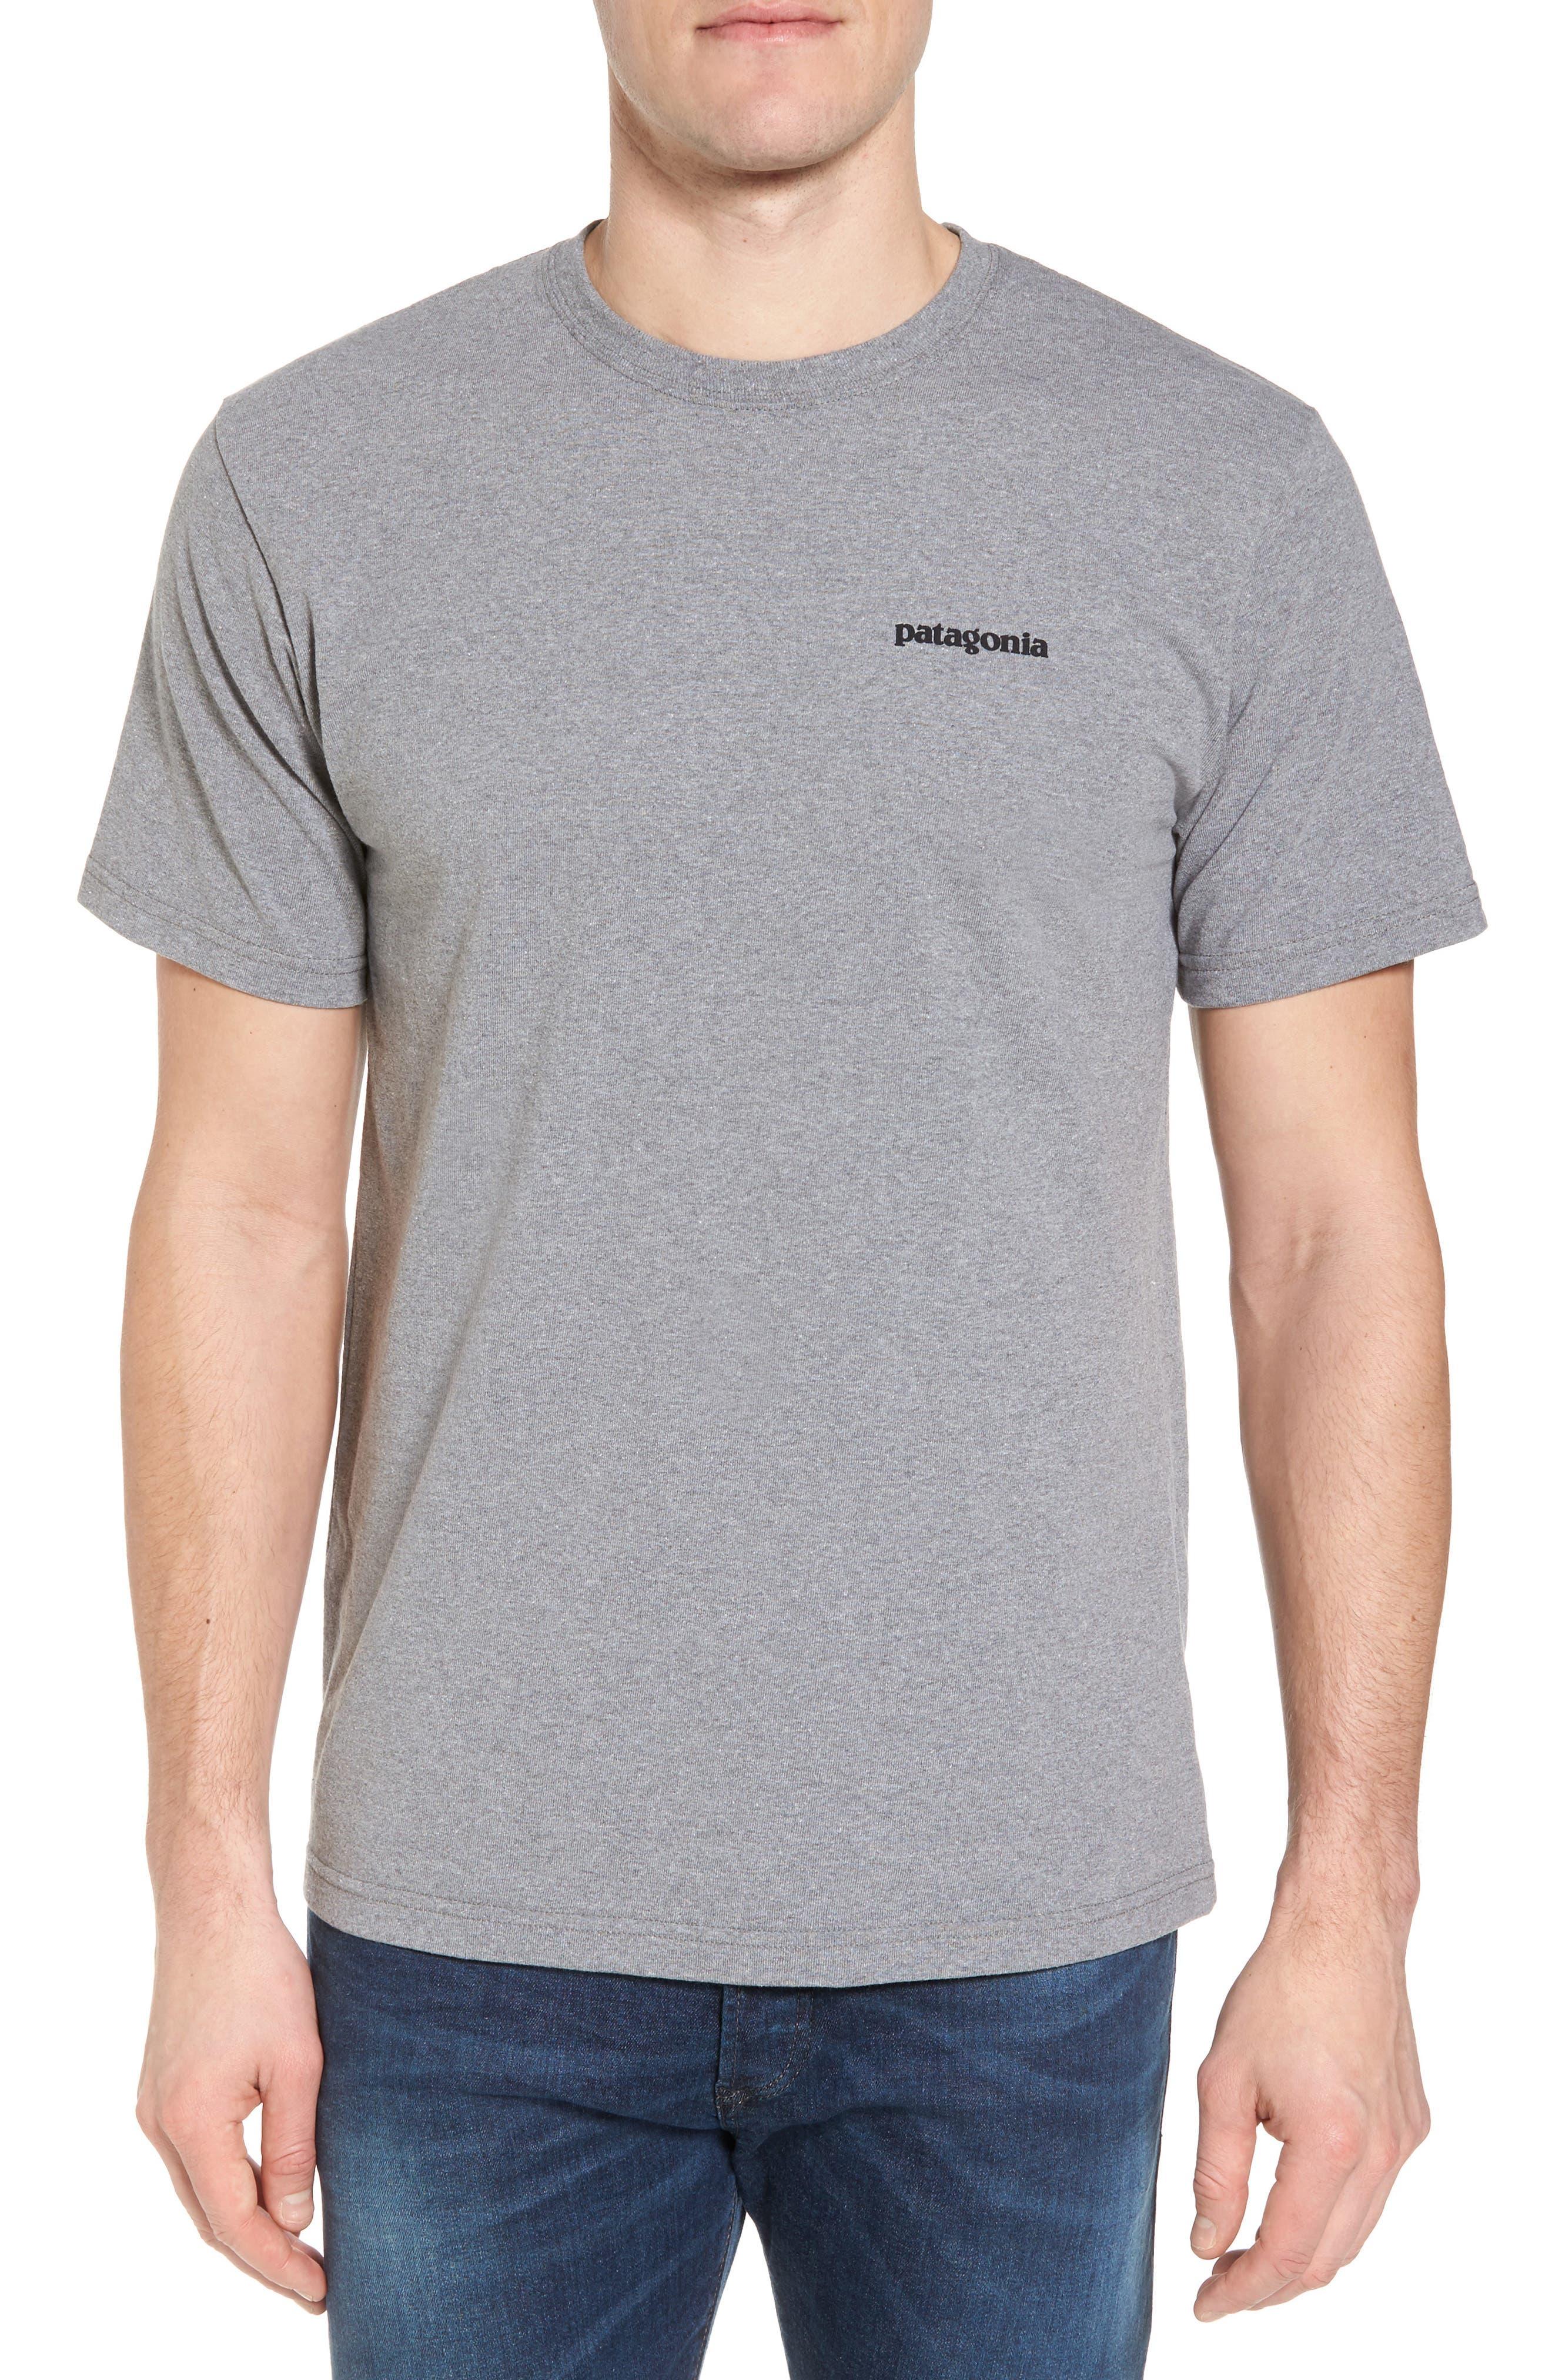 PATAGONIA Responsibili-Tee T-Shirt, Main, color, GRAVEL HEATHER